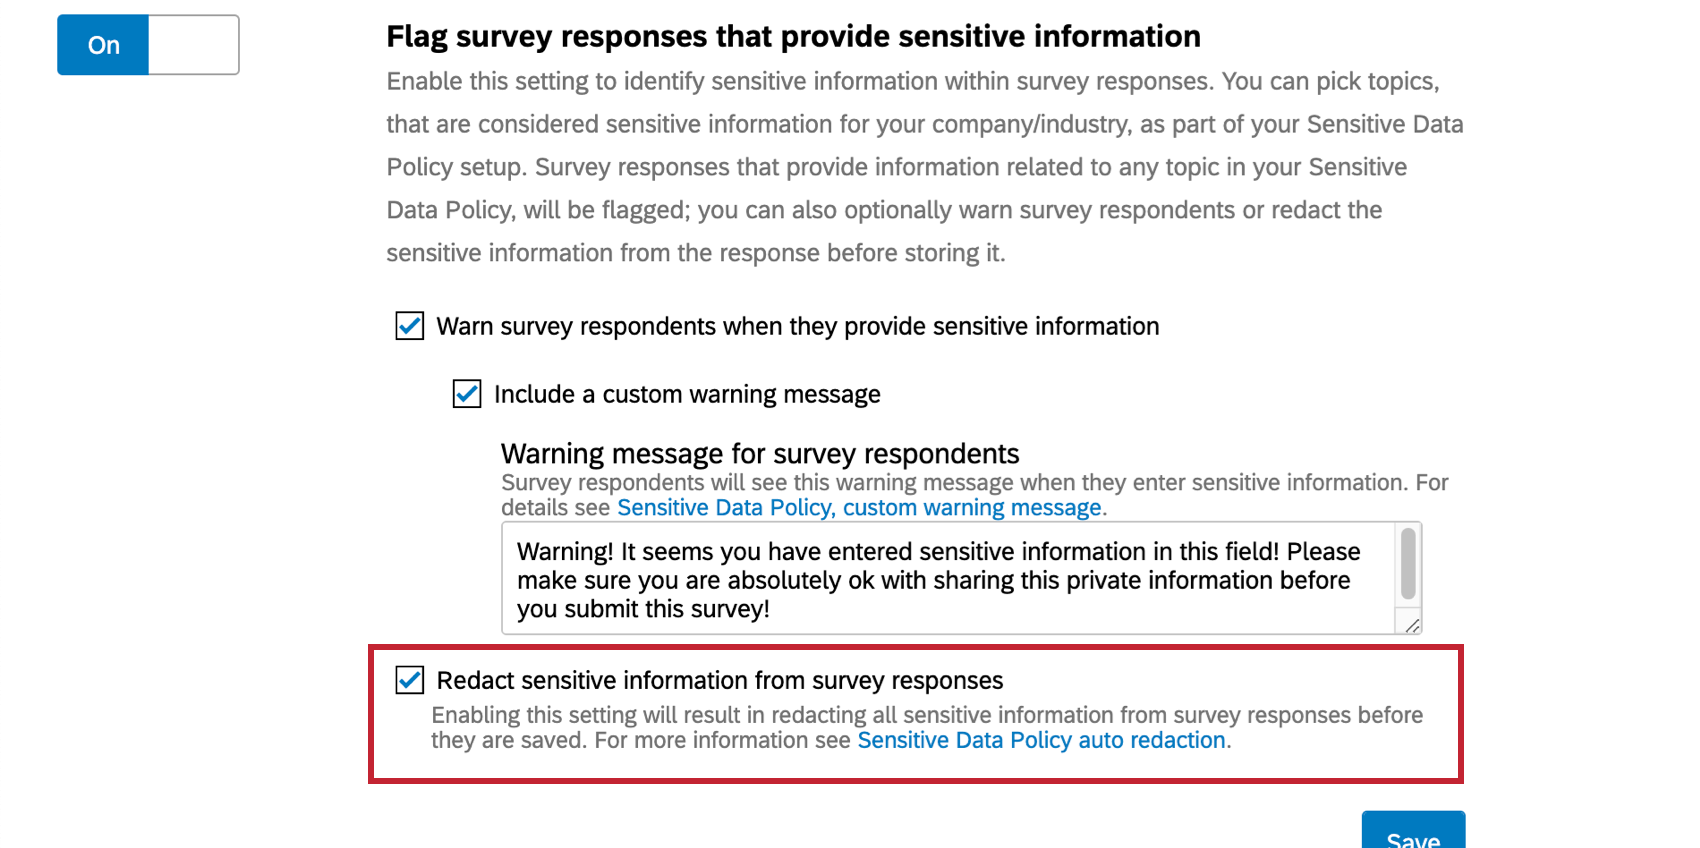 Flag survey responses option - beneath this option, a setting for redaction